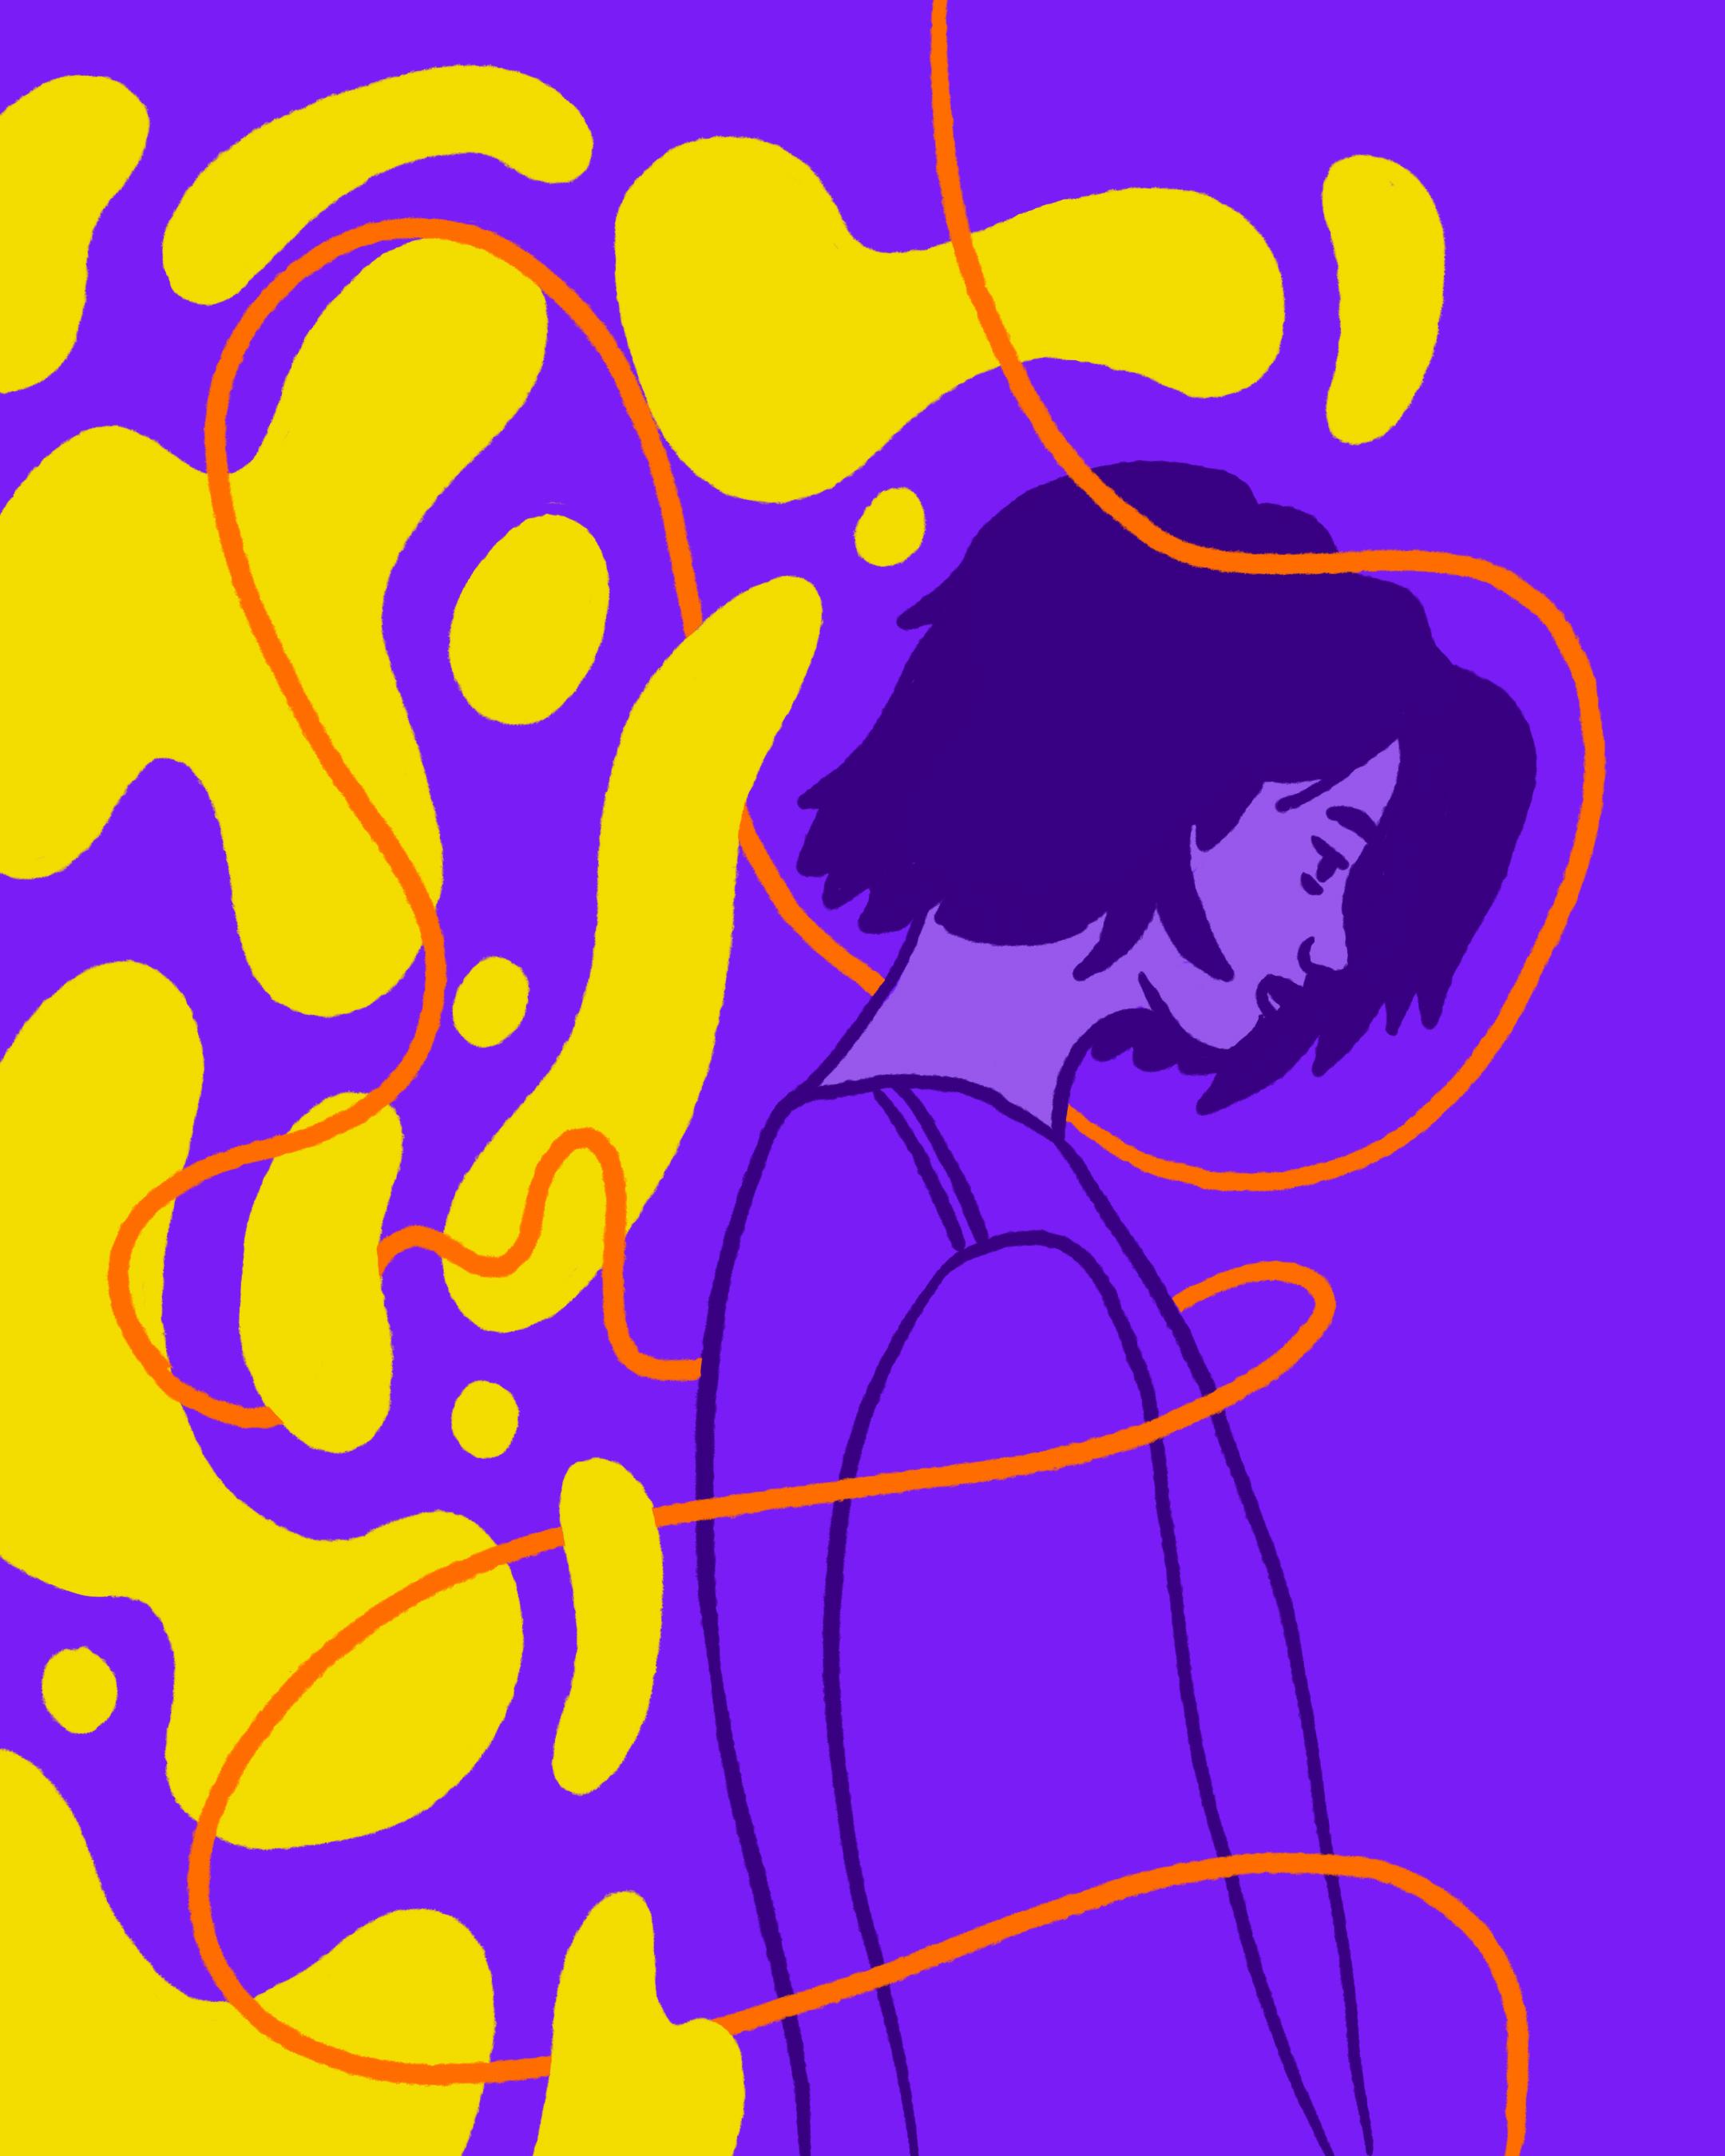 Mhs illustration 258